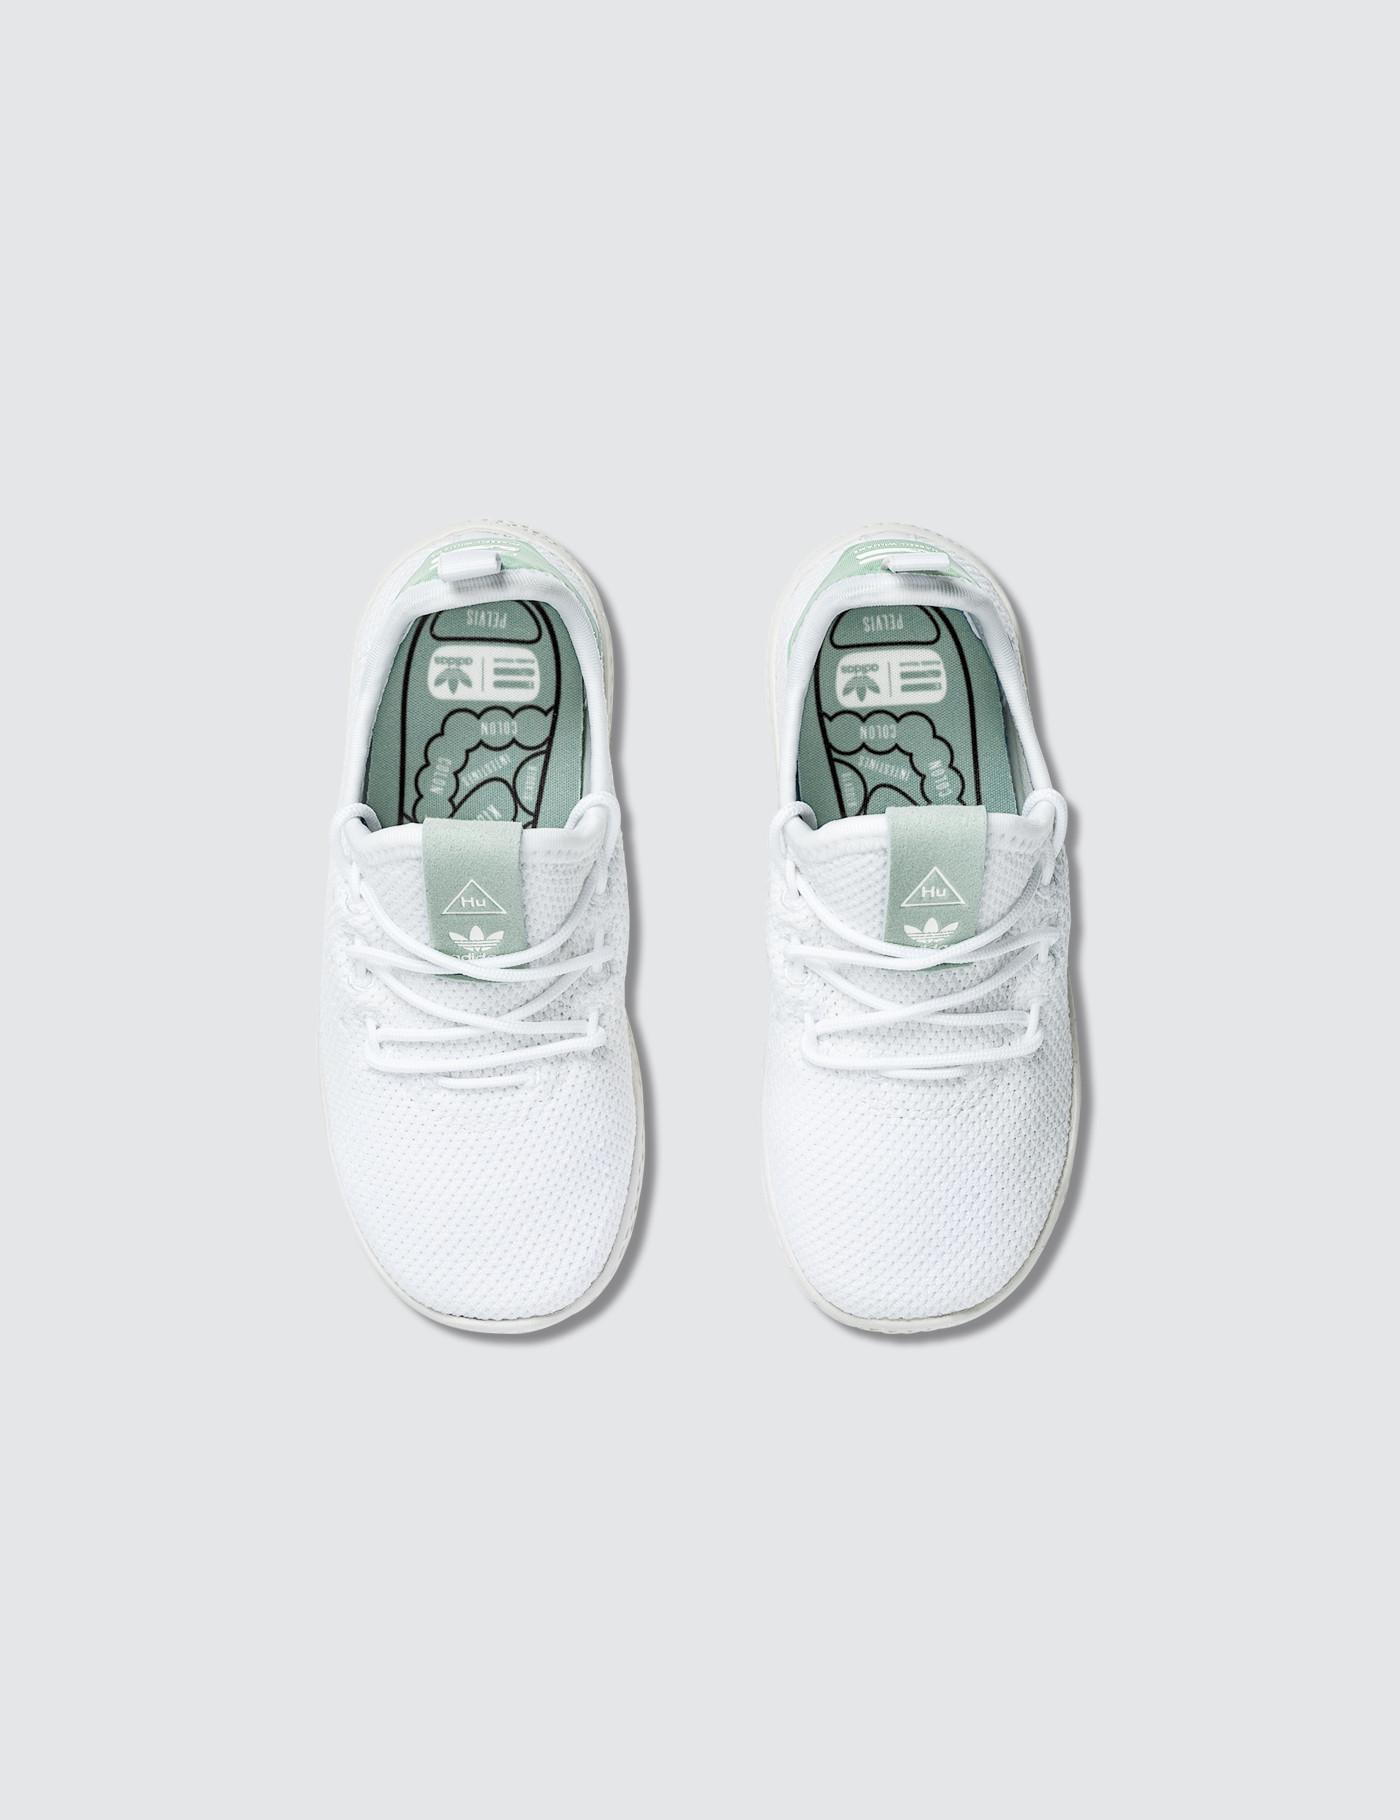 60d52e40c Lyst - adidas Originals Pharrell Williams X Adidas Pw Tennis Hu Infants in  White for Men